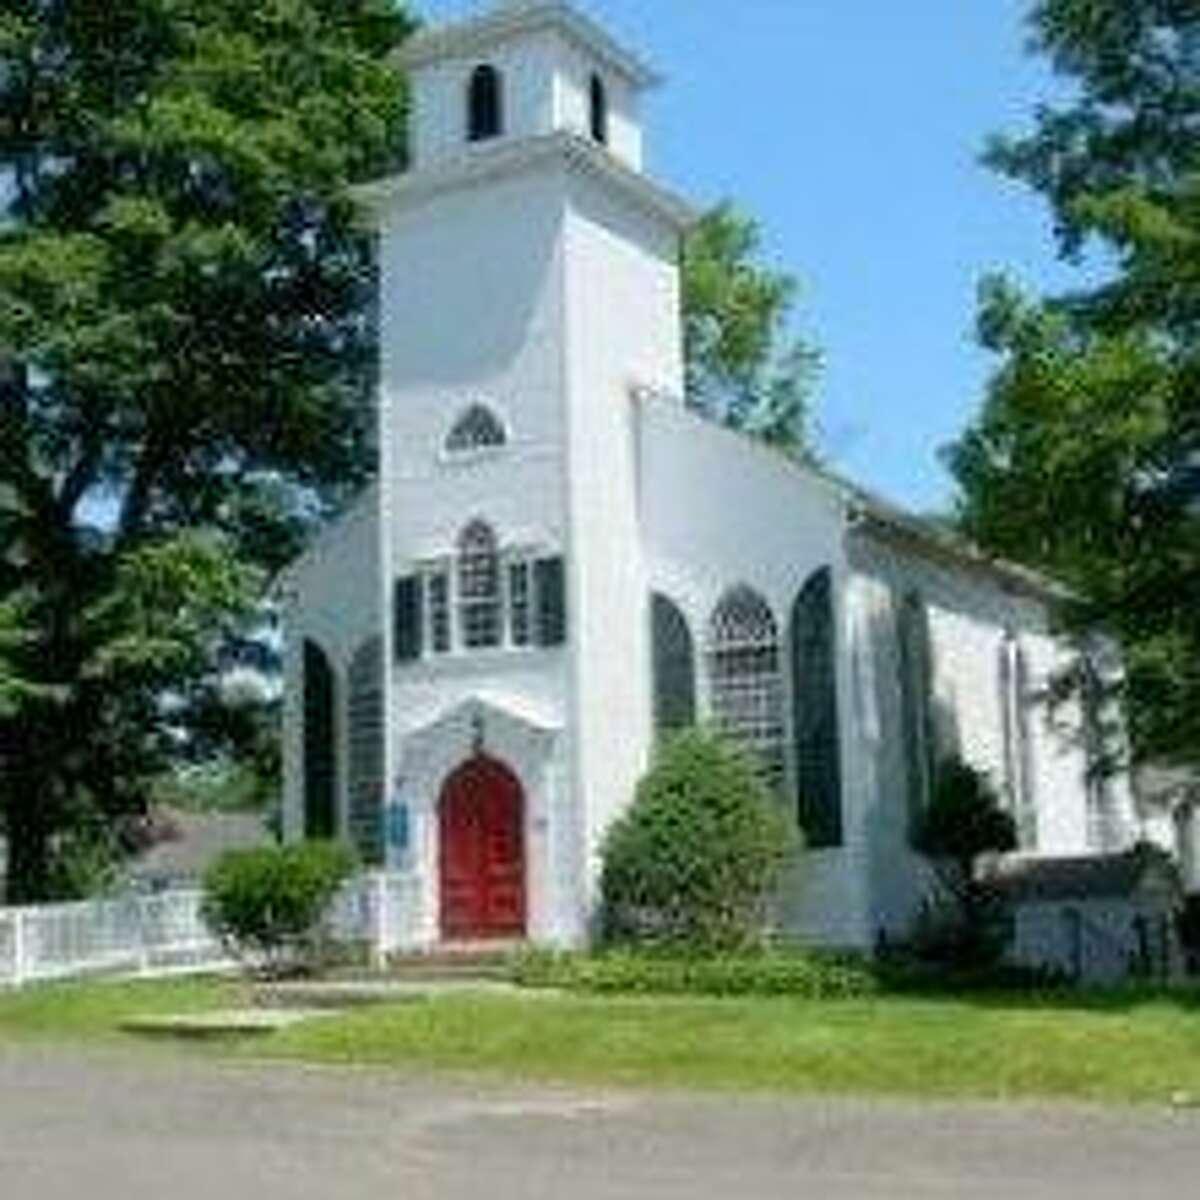 St. John's Episcopal Church in Guilford